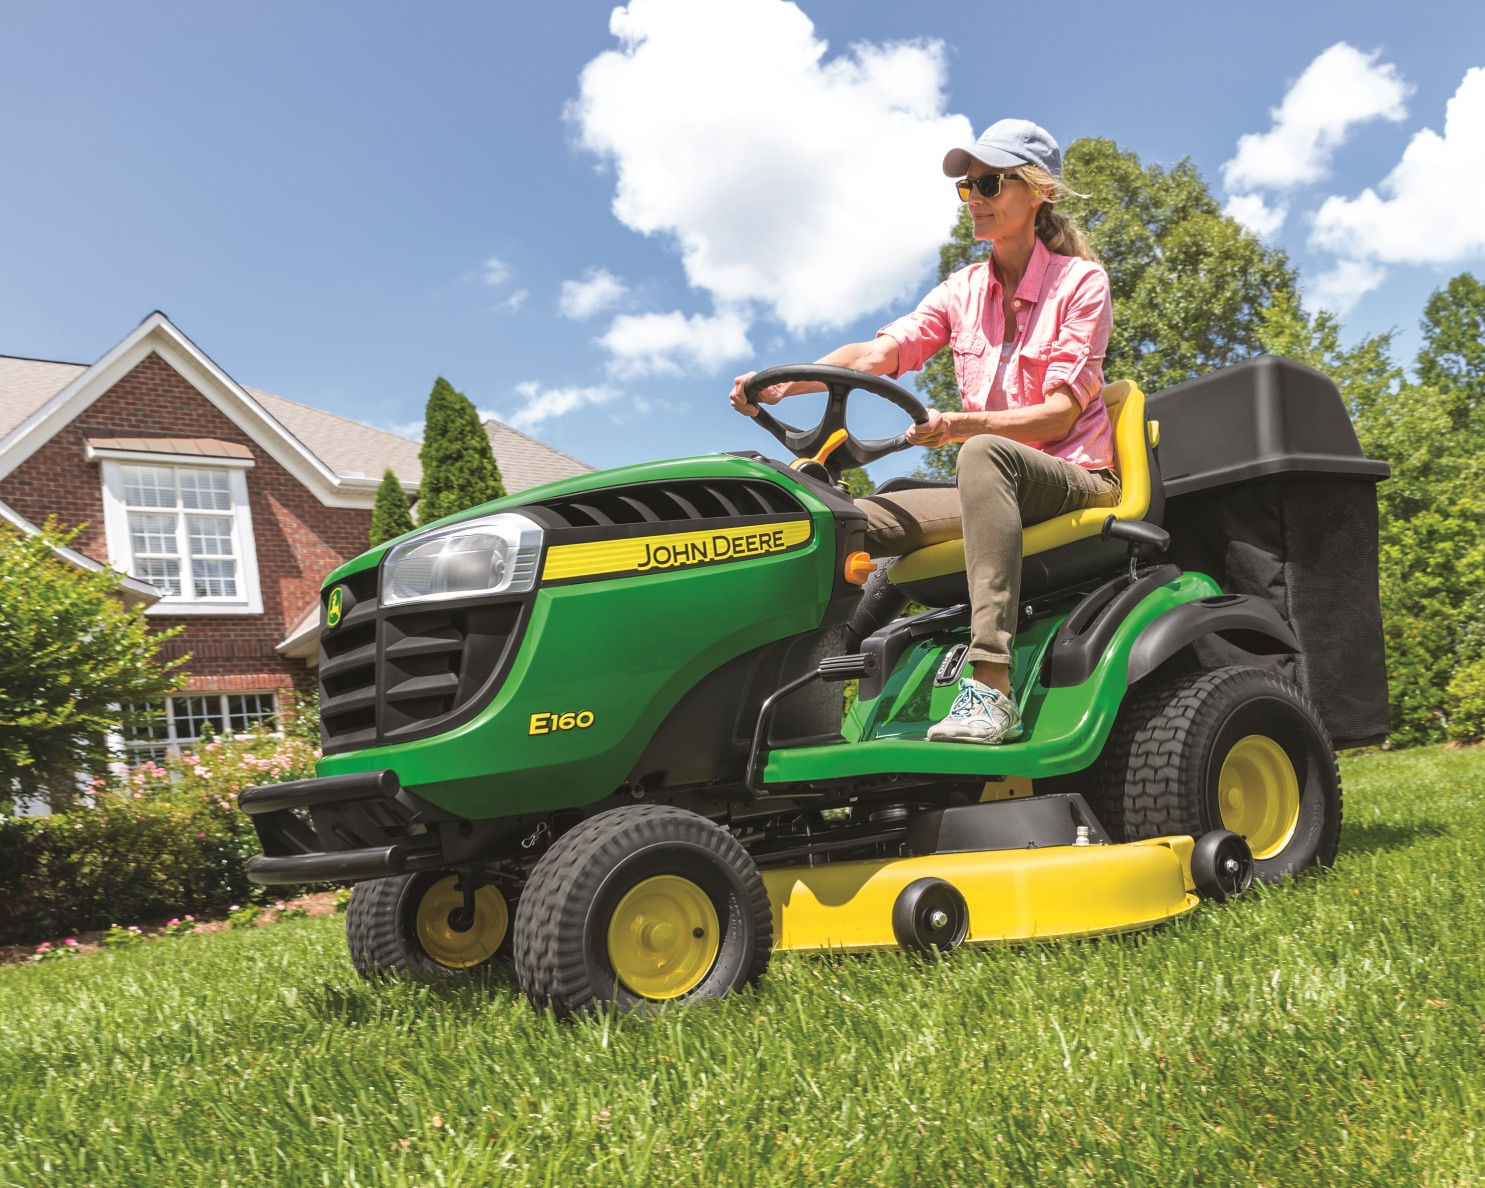 John Deere Riding Lawn Mowers Quality Equipment North